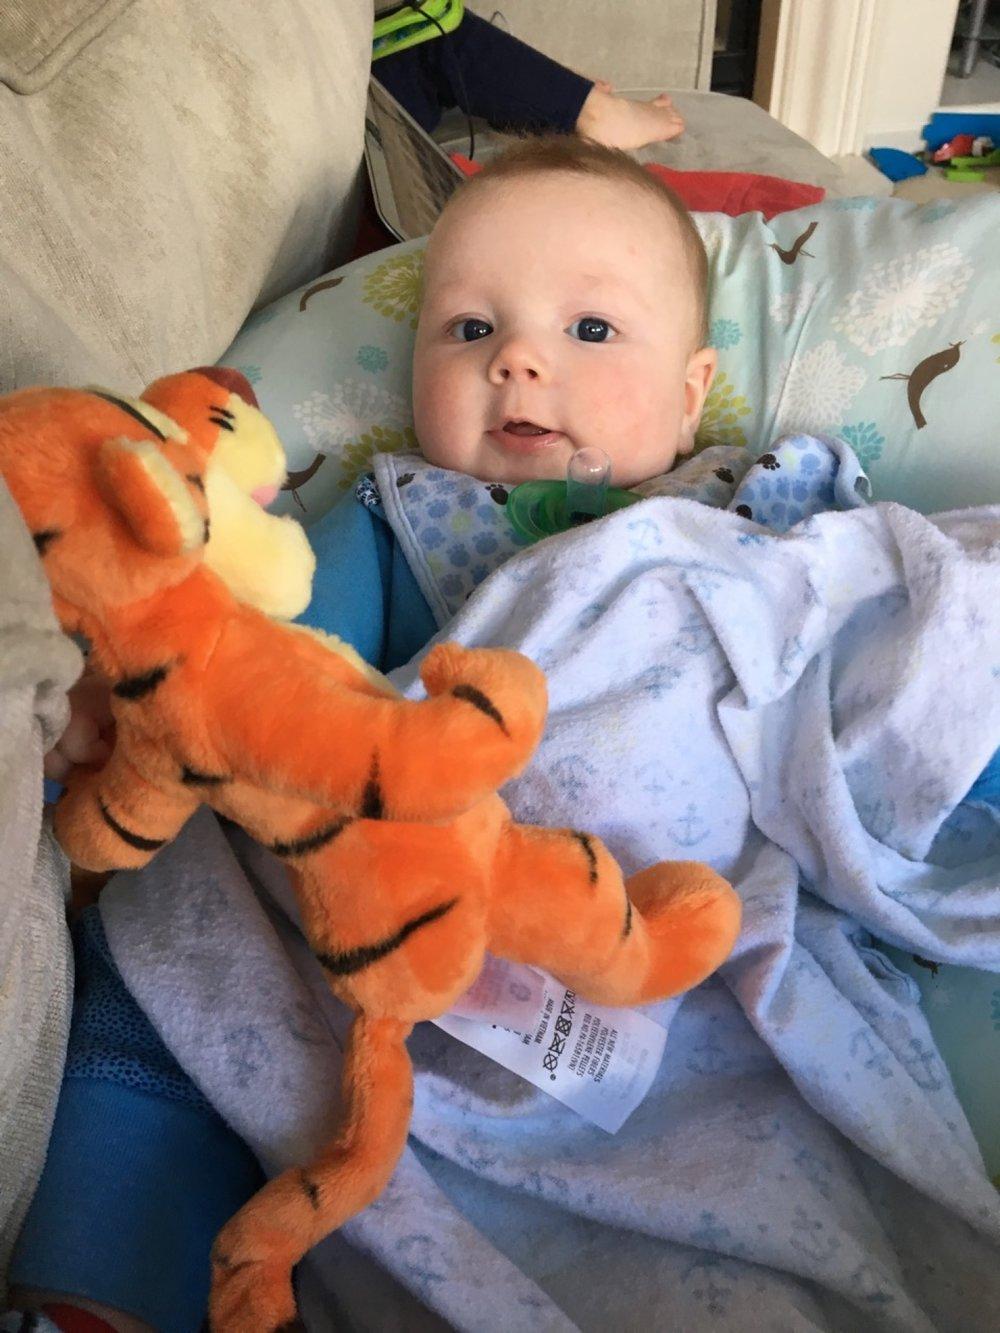 His new friend Tigger